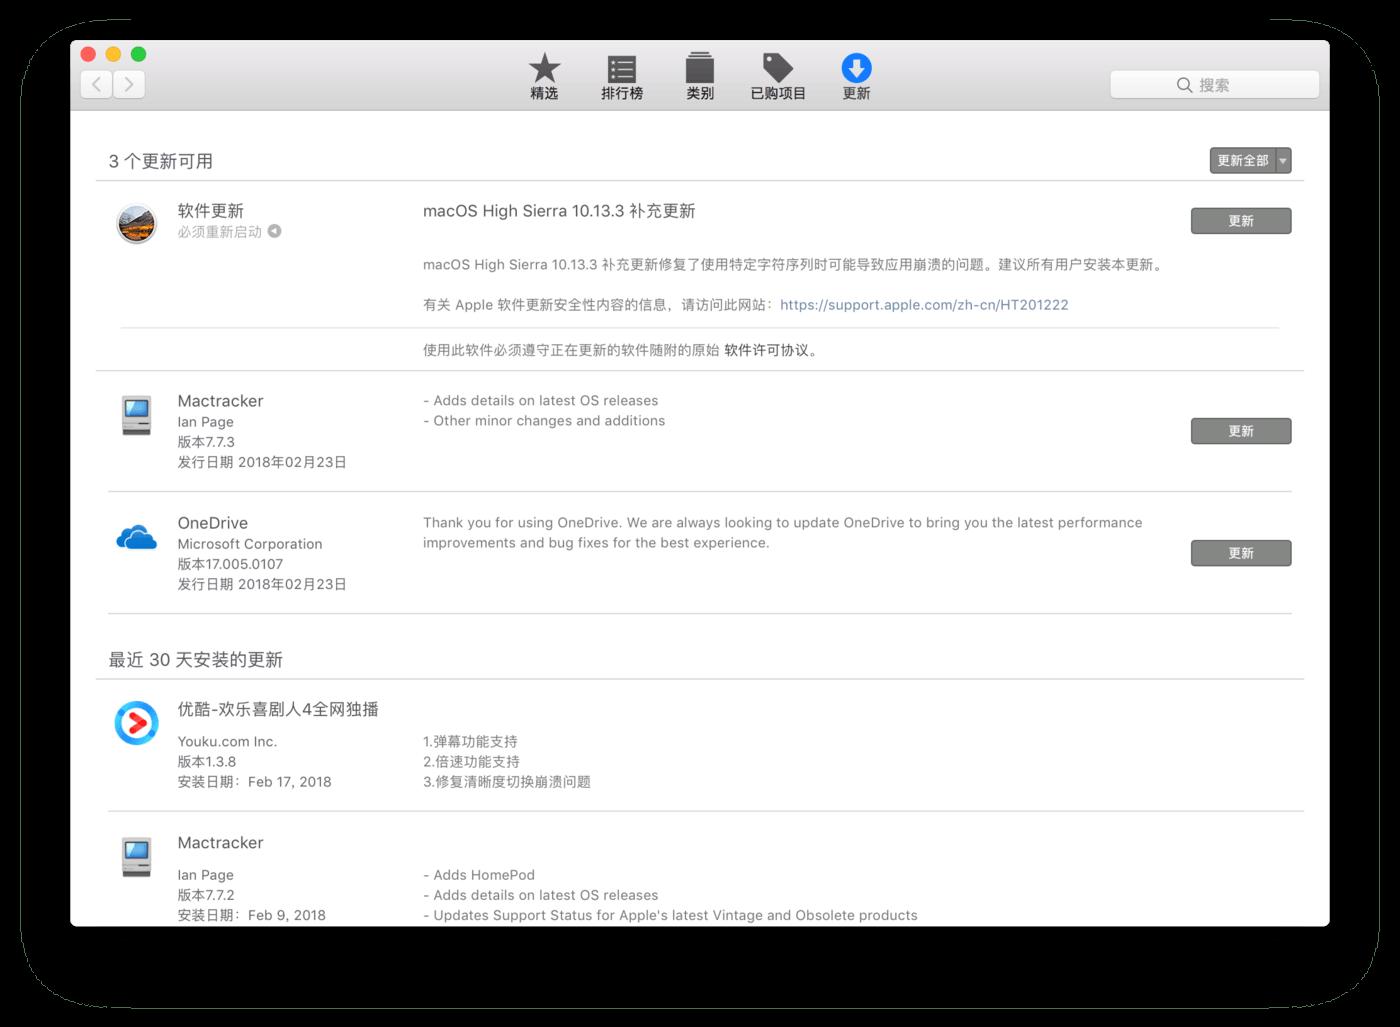 macOS High Sierra 10.13.3 补充更新